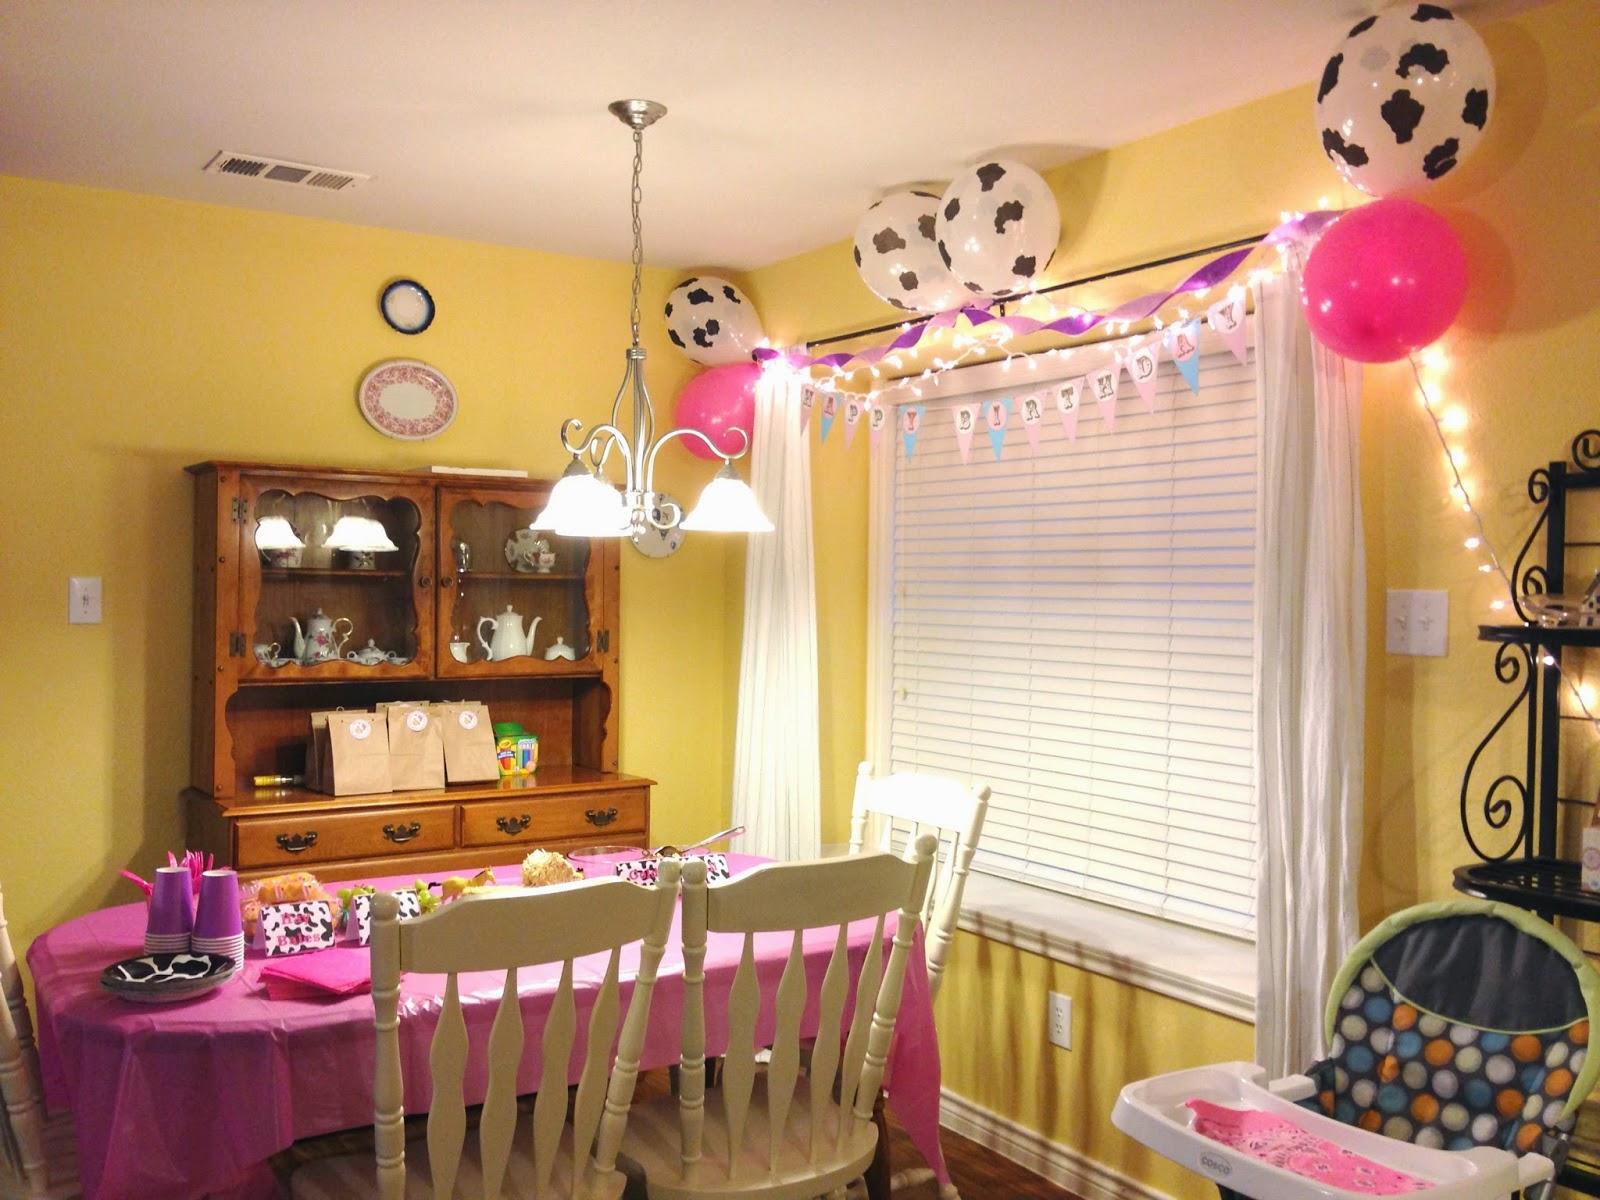 Cowgirl Birthday Decorations Cowgirl Birthday Party Amanda G Whitaker